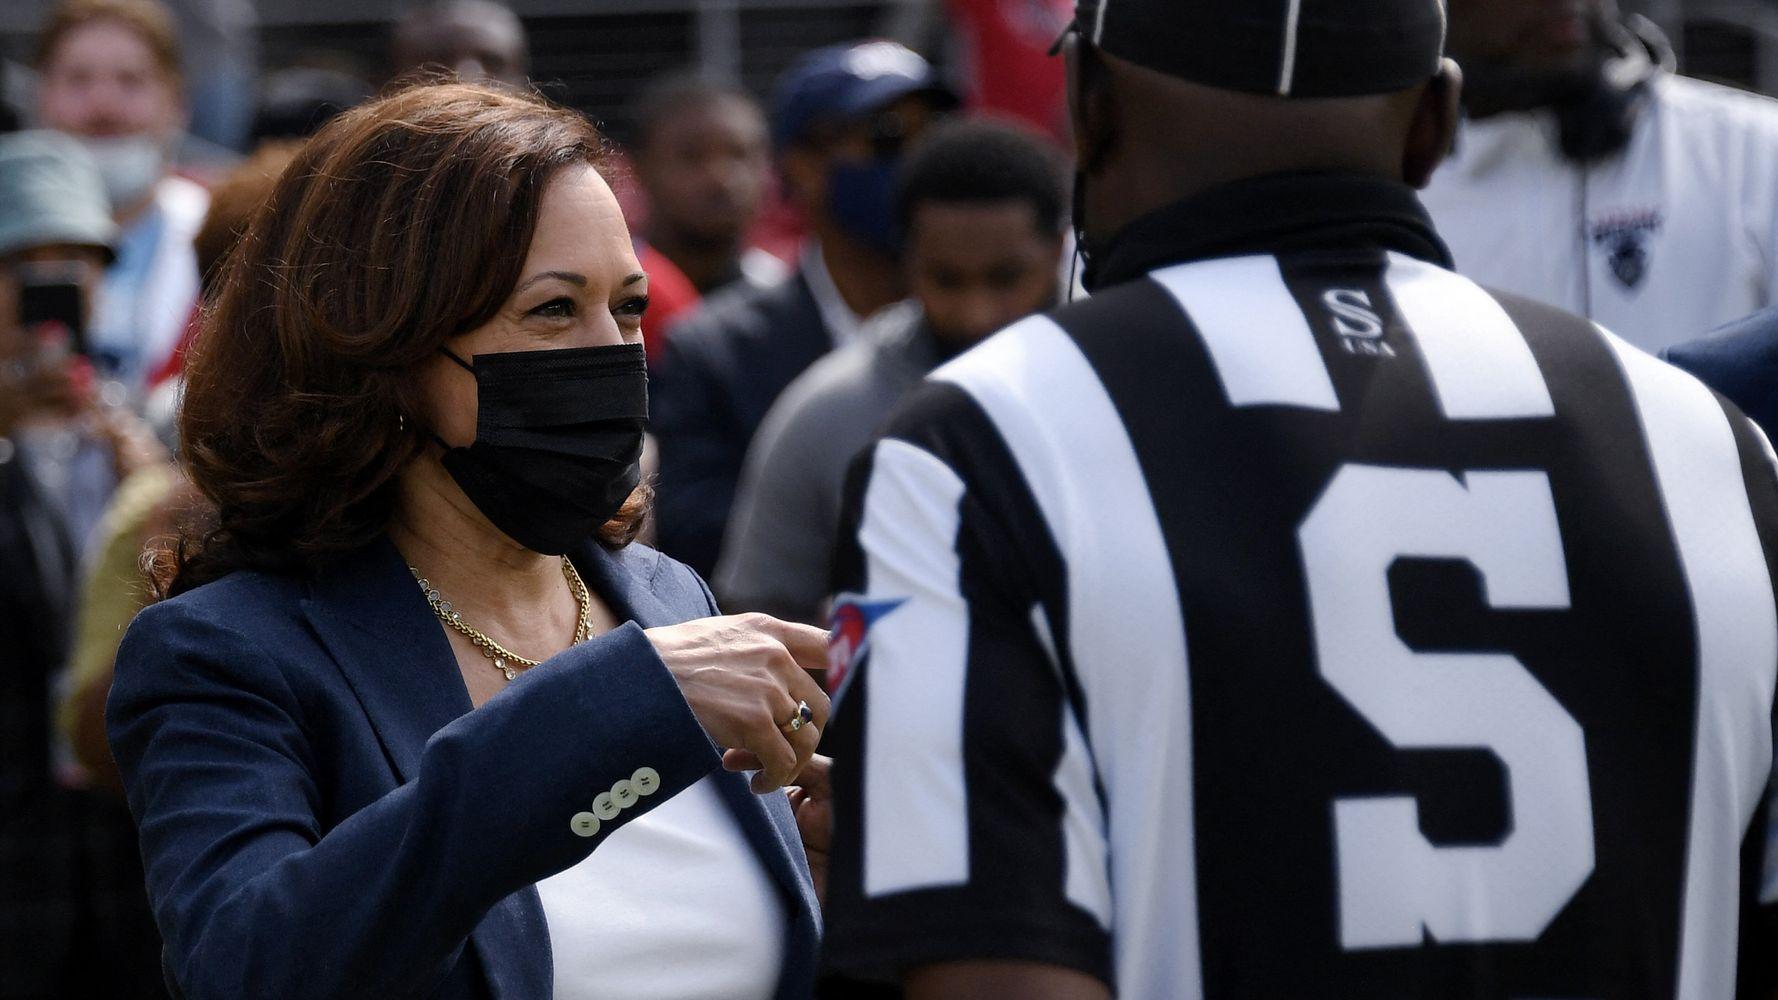 Fox News Host Rachel Campos-Duffy Attacks Kamala Harris For Attending A Football Game